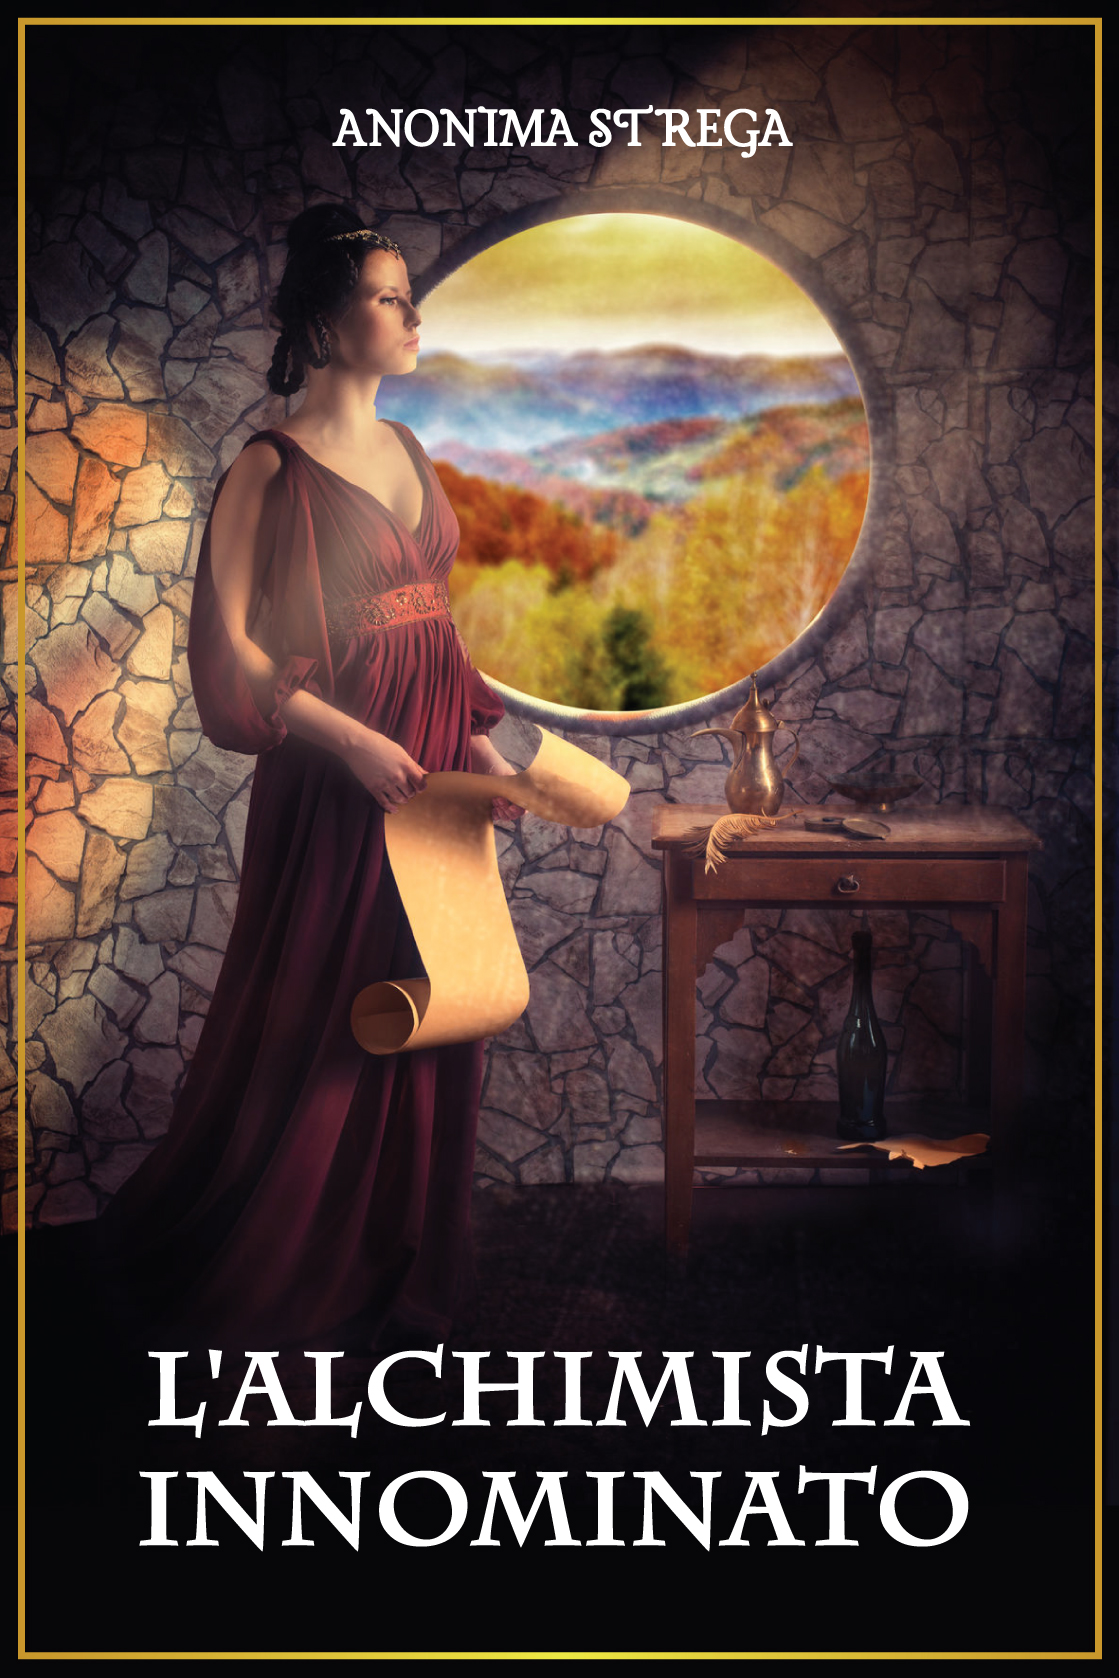 L'alchimista Innominato